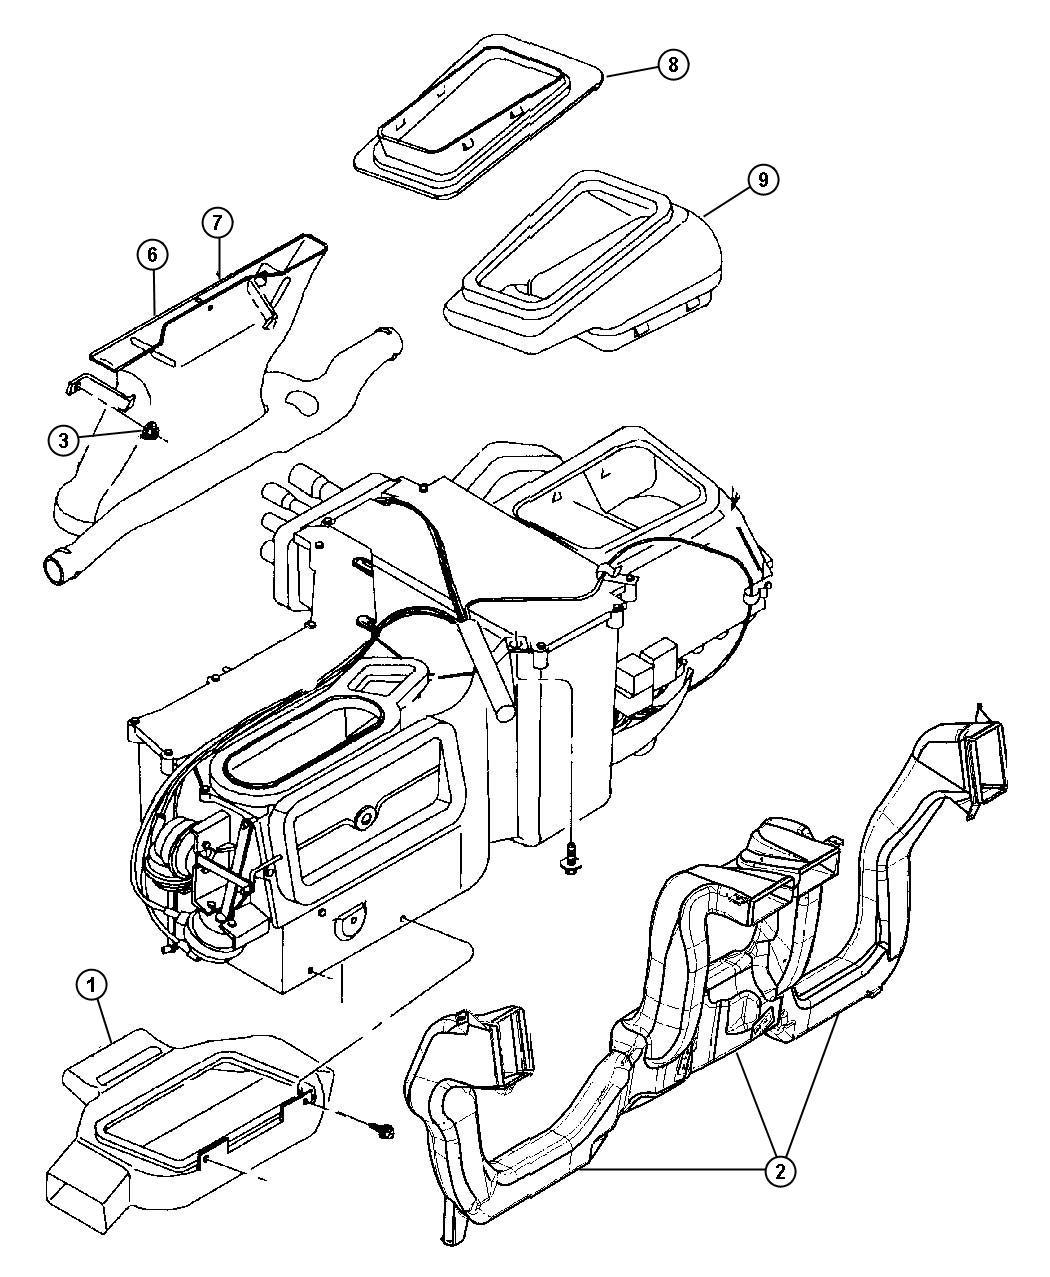 Jeep Wrangler Adapter. Demister. Right. Instrument panel